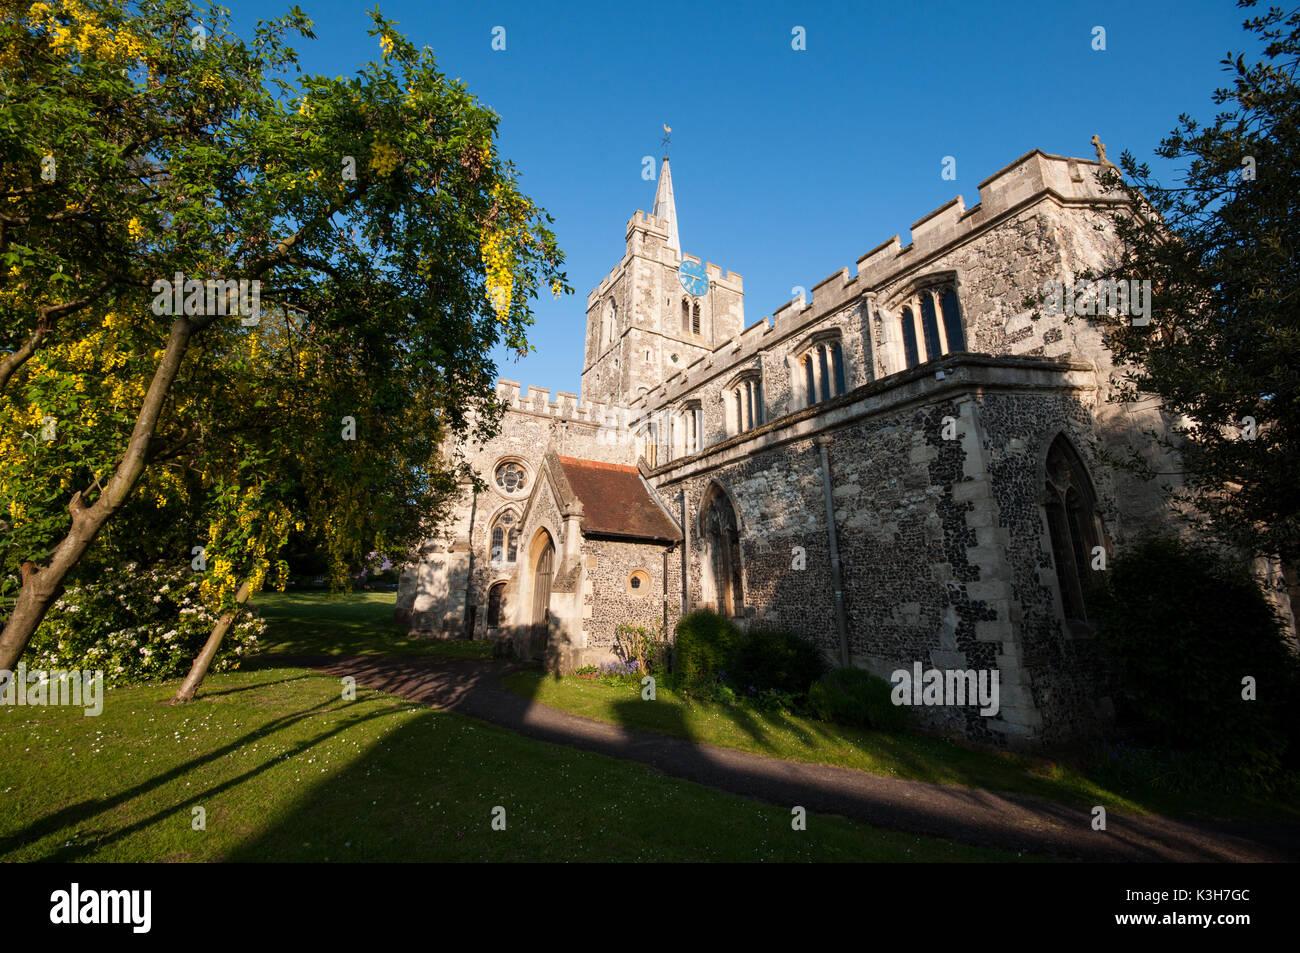 St Mary the Virgin Parish Church, Ivinghoe, Buckinghamshire - Stock Image